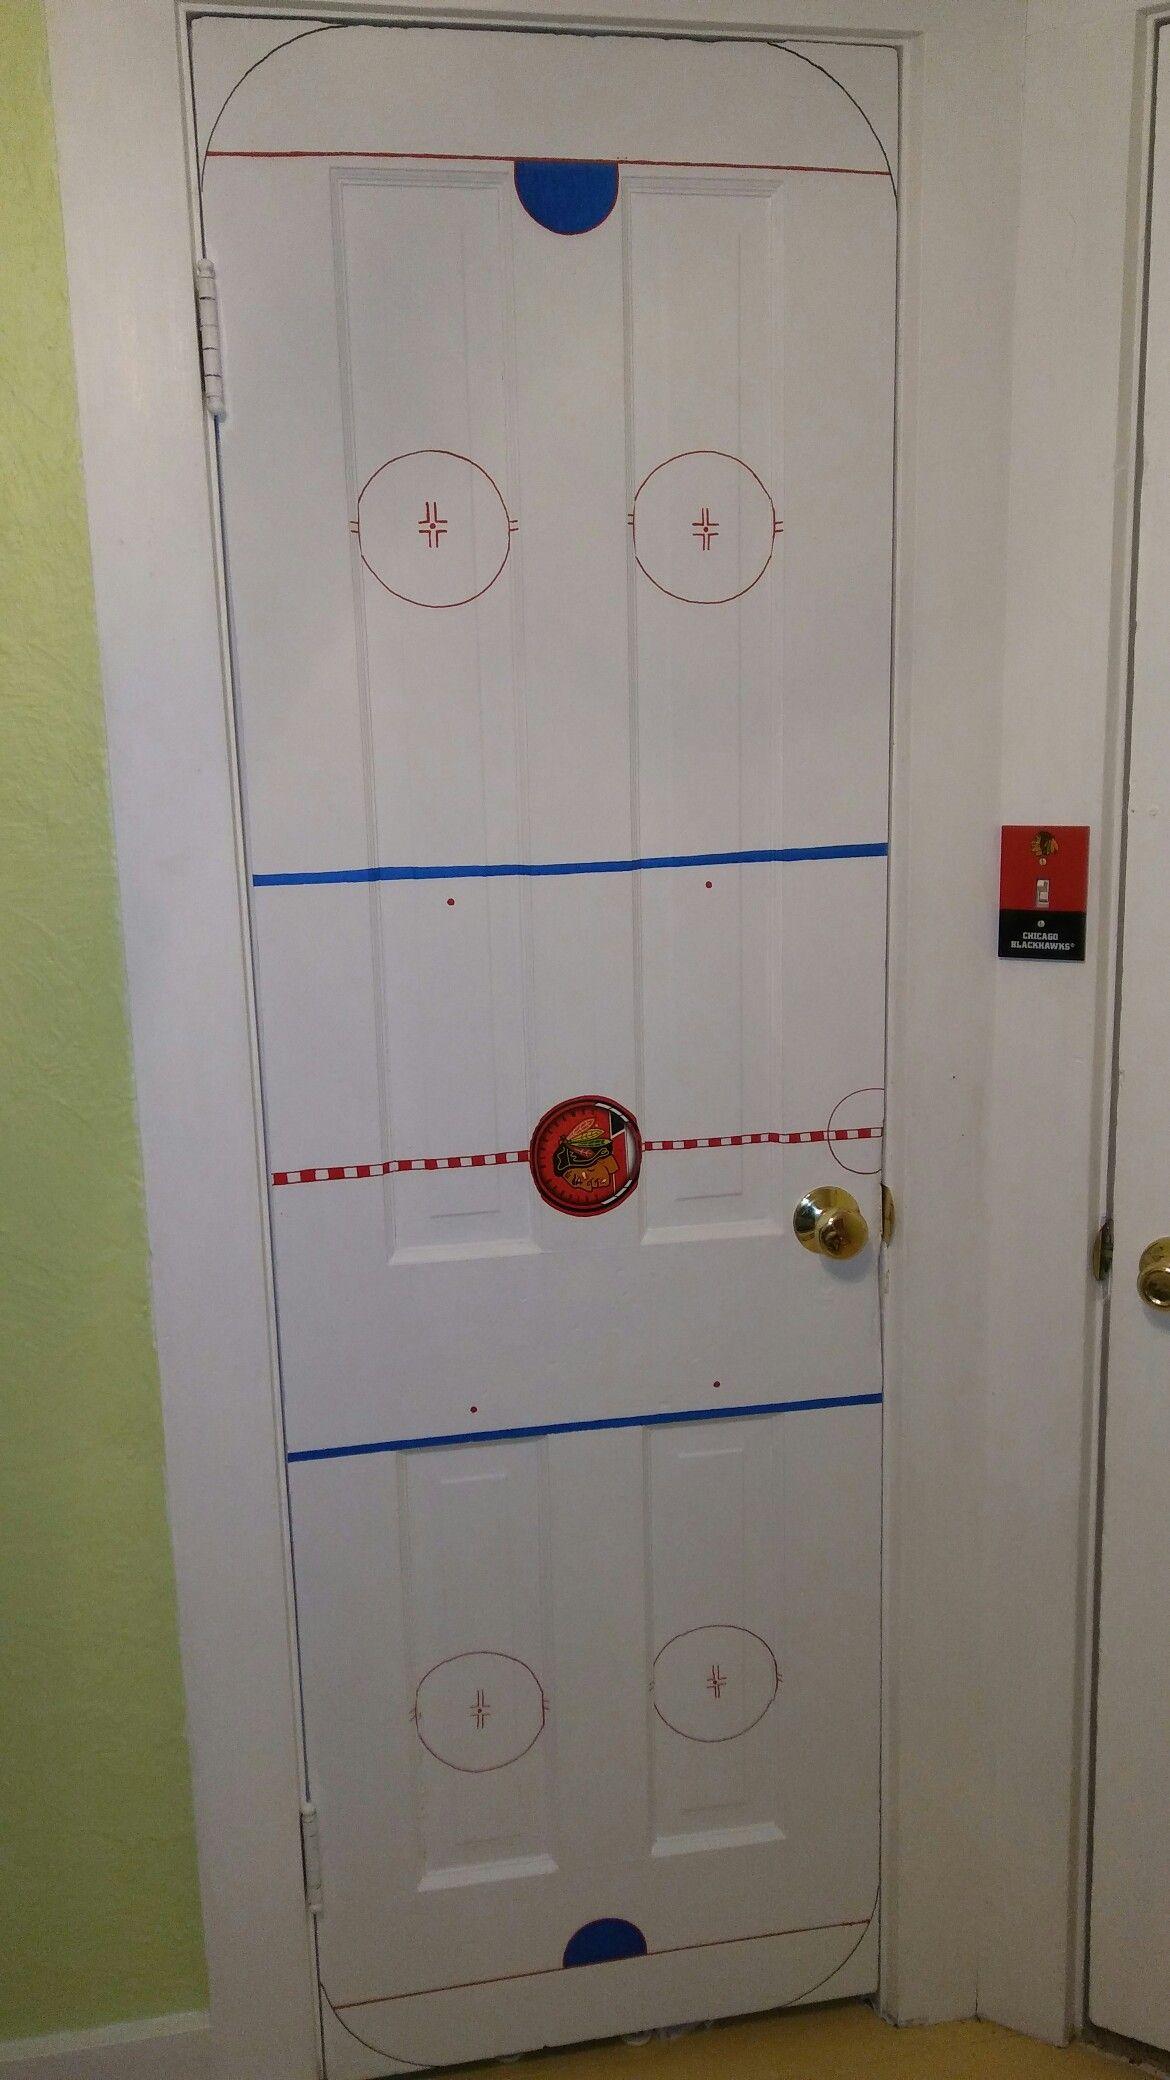 Hockey Bedroom Decor Canada: Chicago Blackhawks Hockey Rink Door!